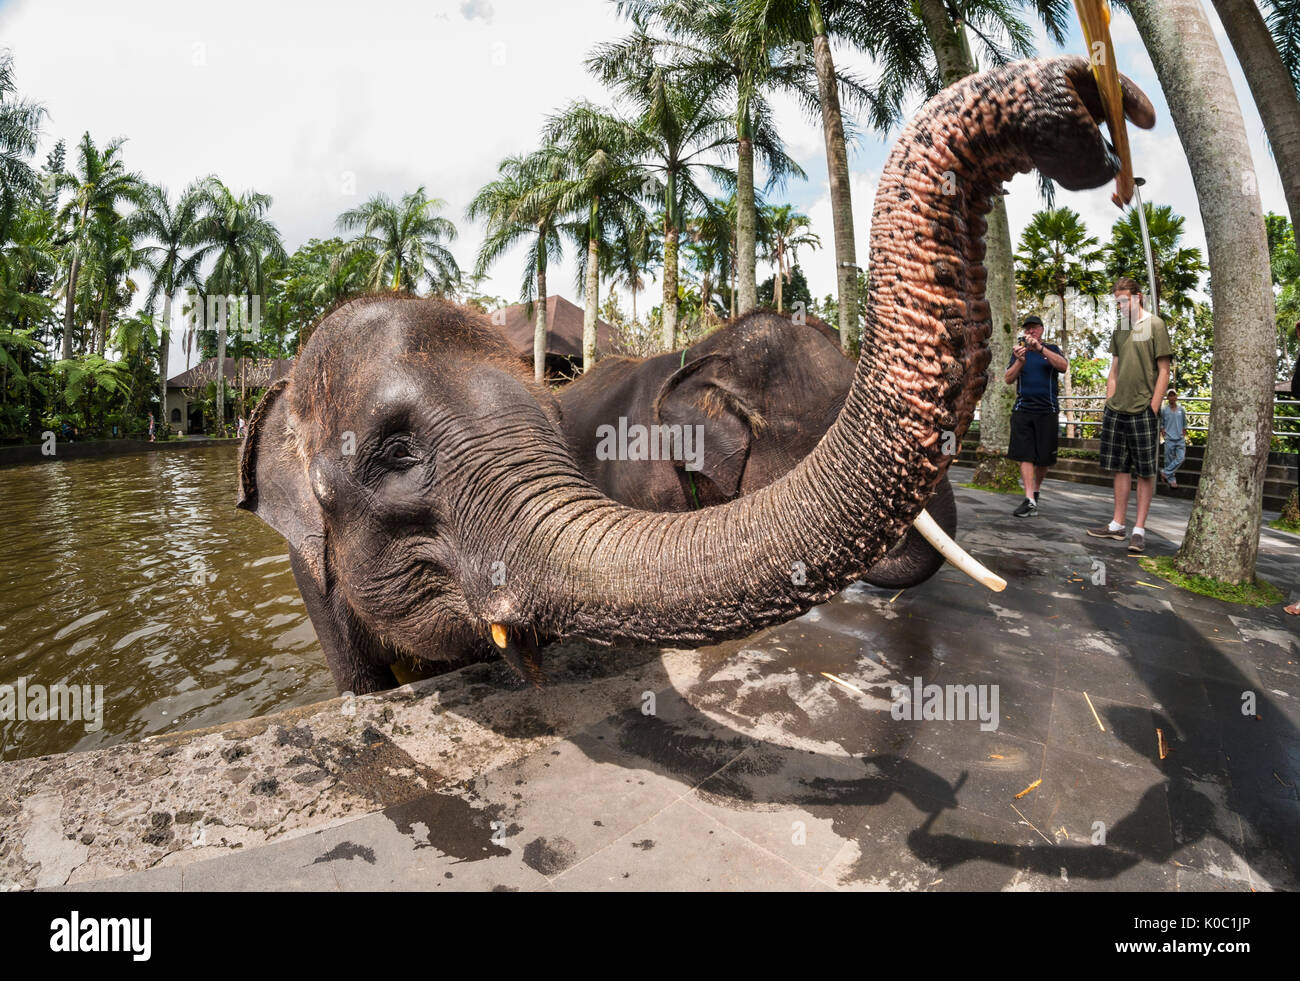 Tourists feeding rescued Sumatran elephants at the Elephant Safari Park at Taro, Bali, Indonesia - Stock Image